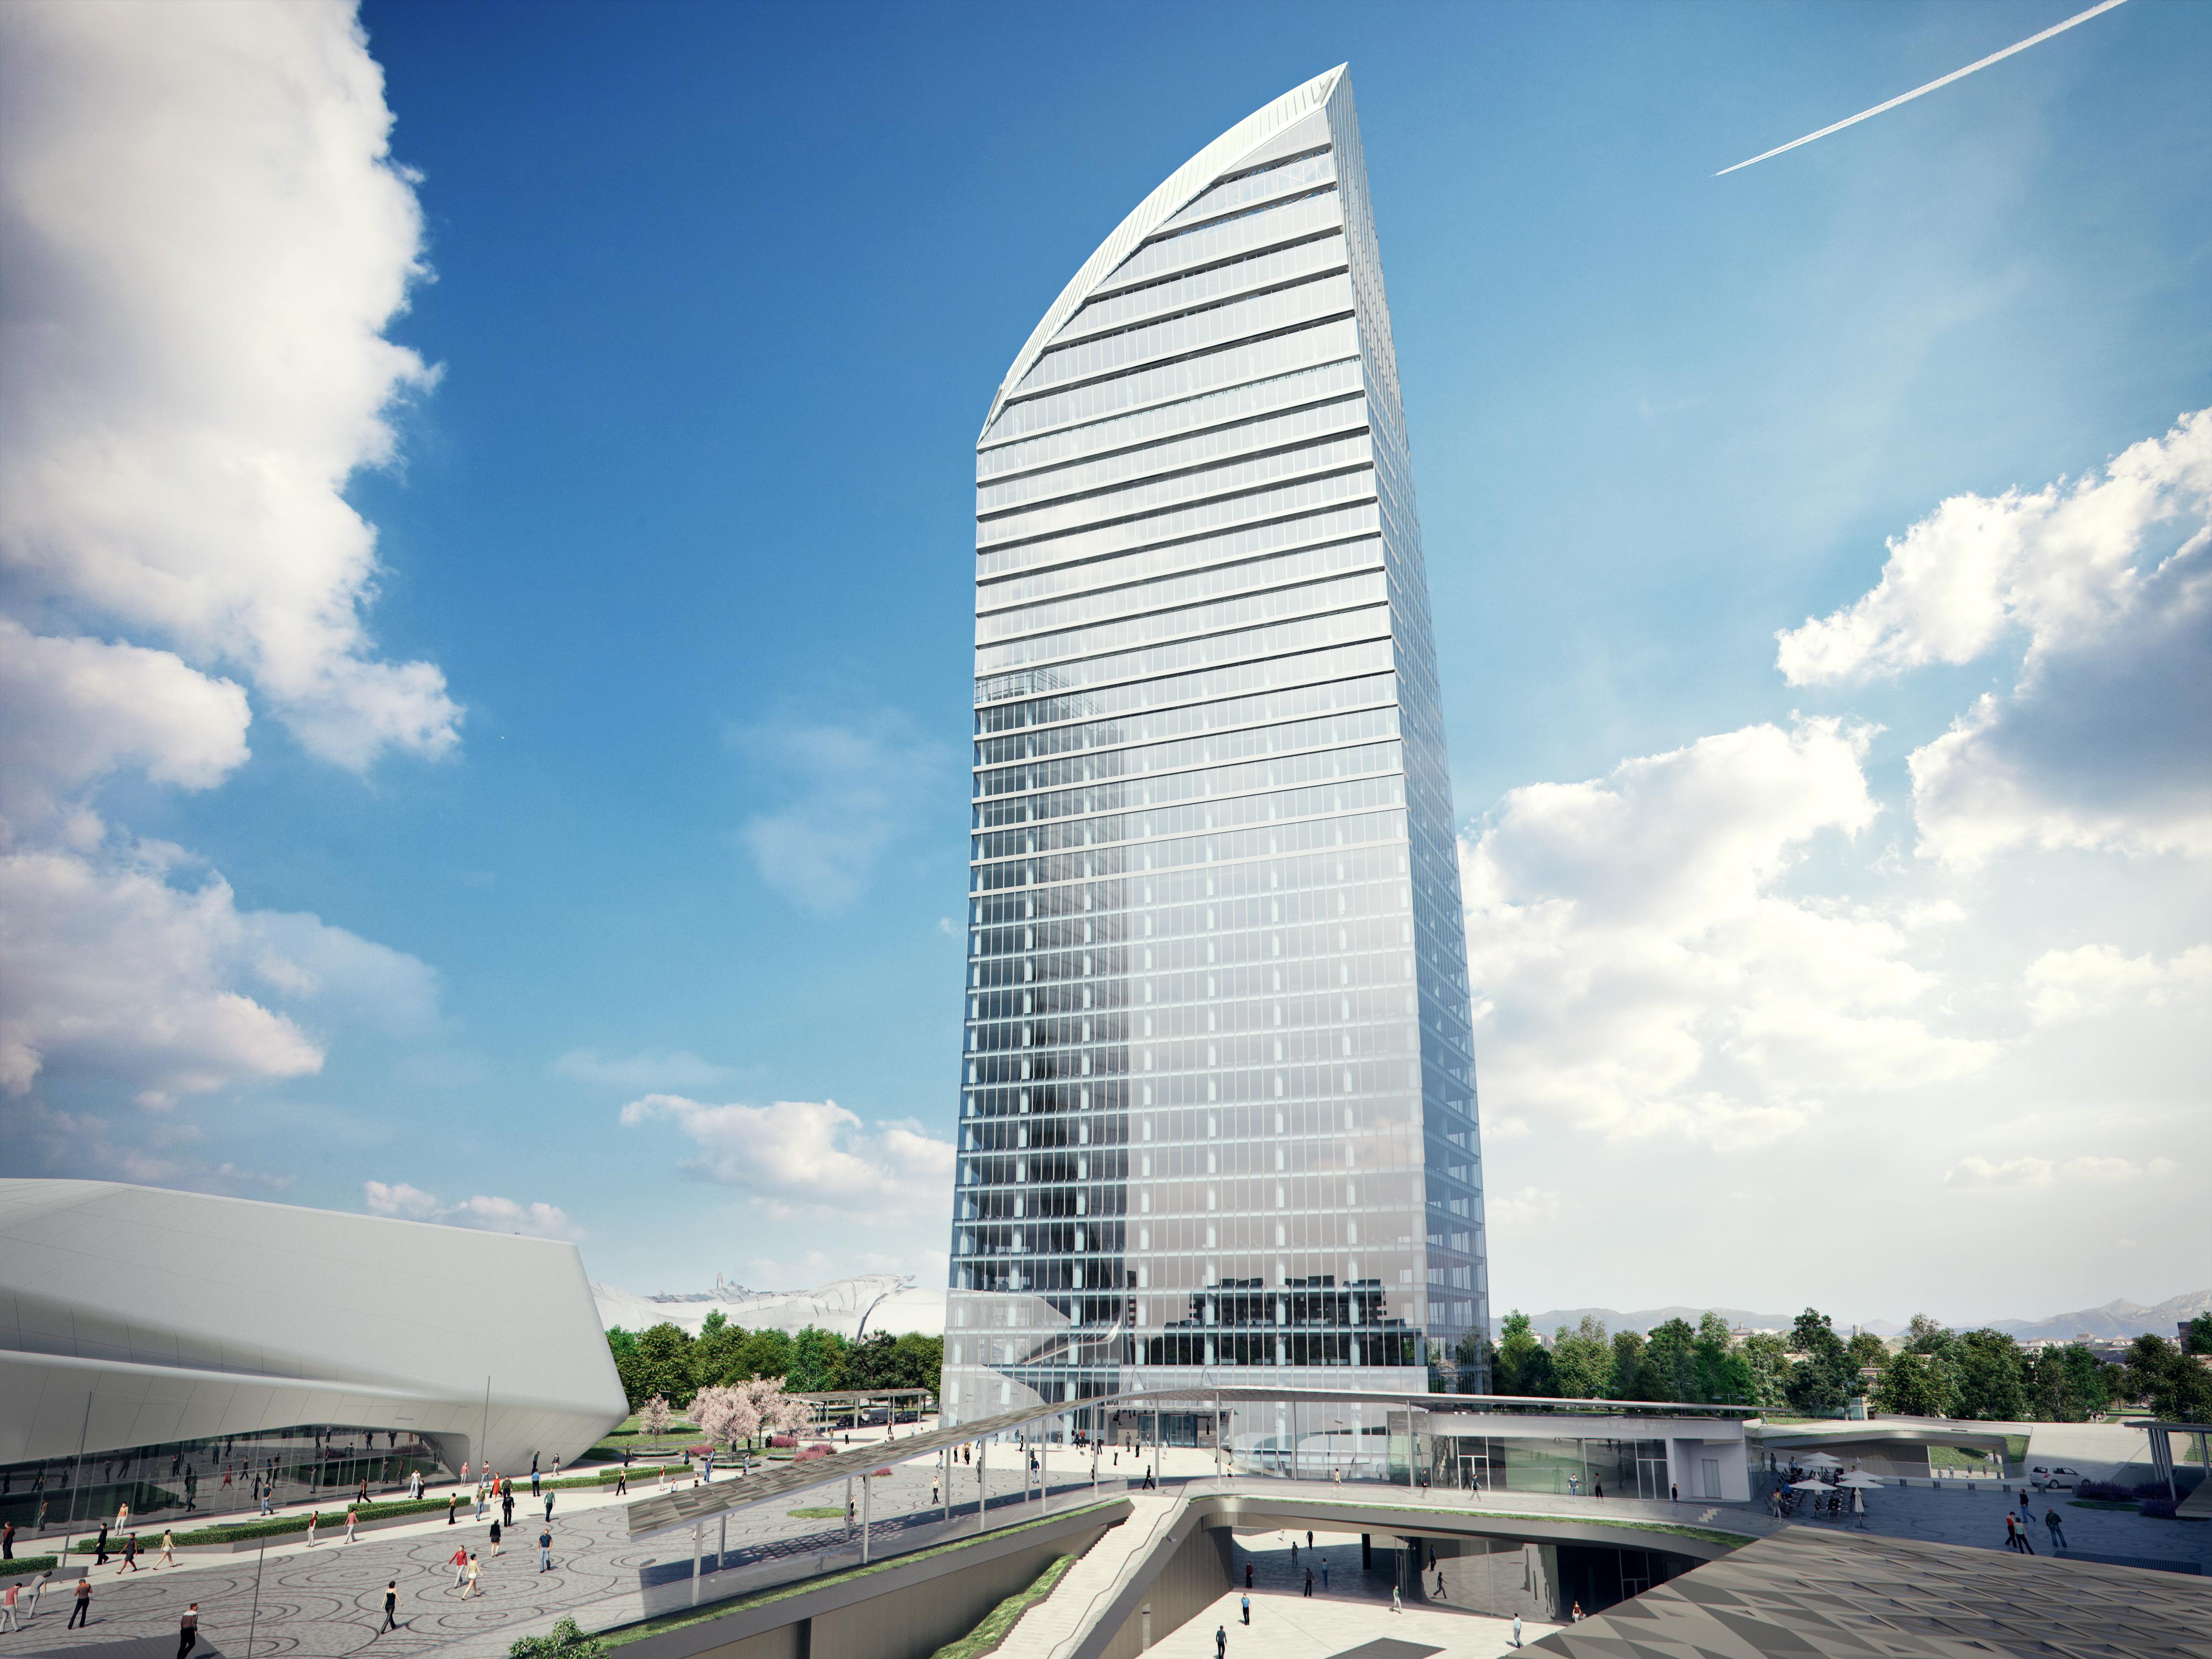 La torre Libeskind a Milano